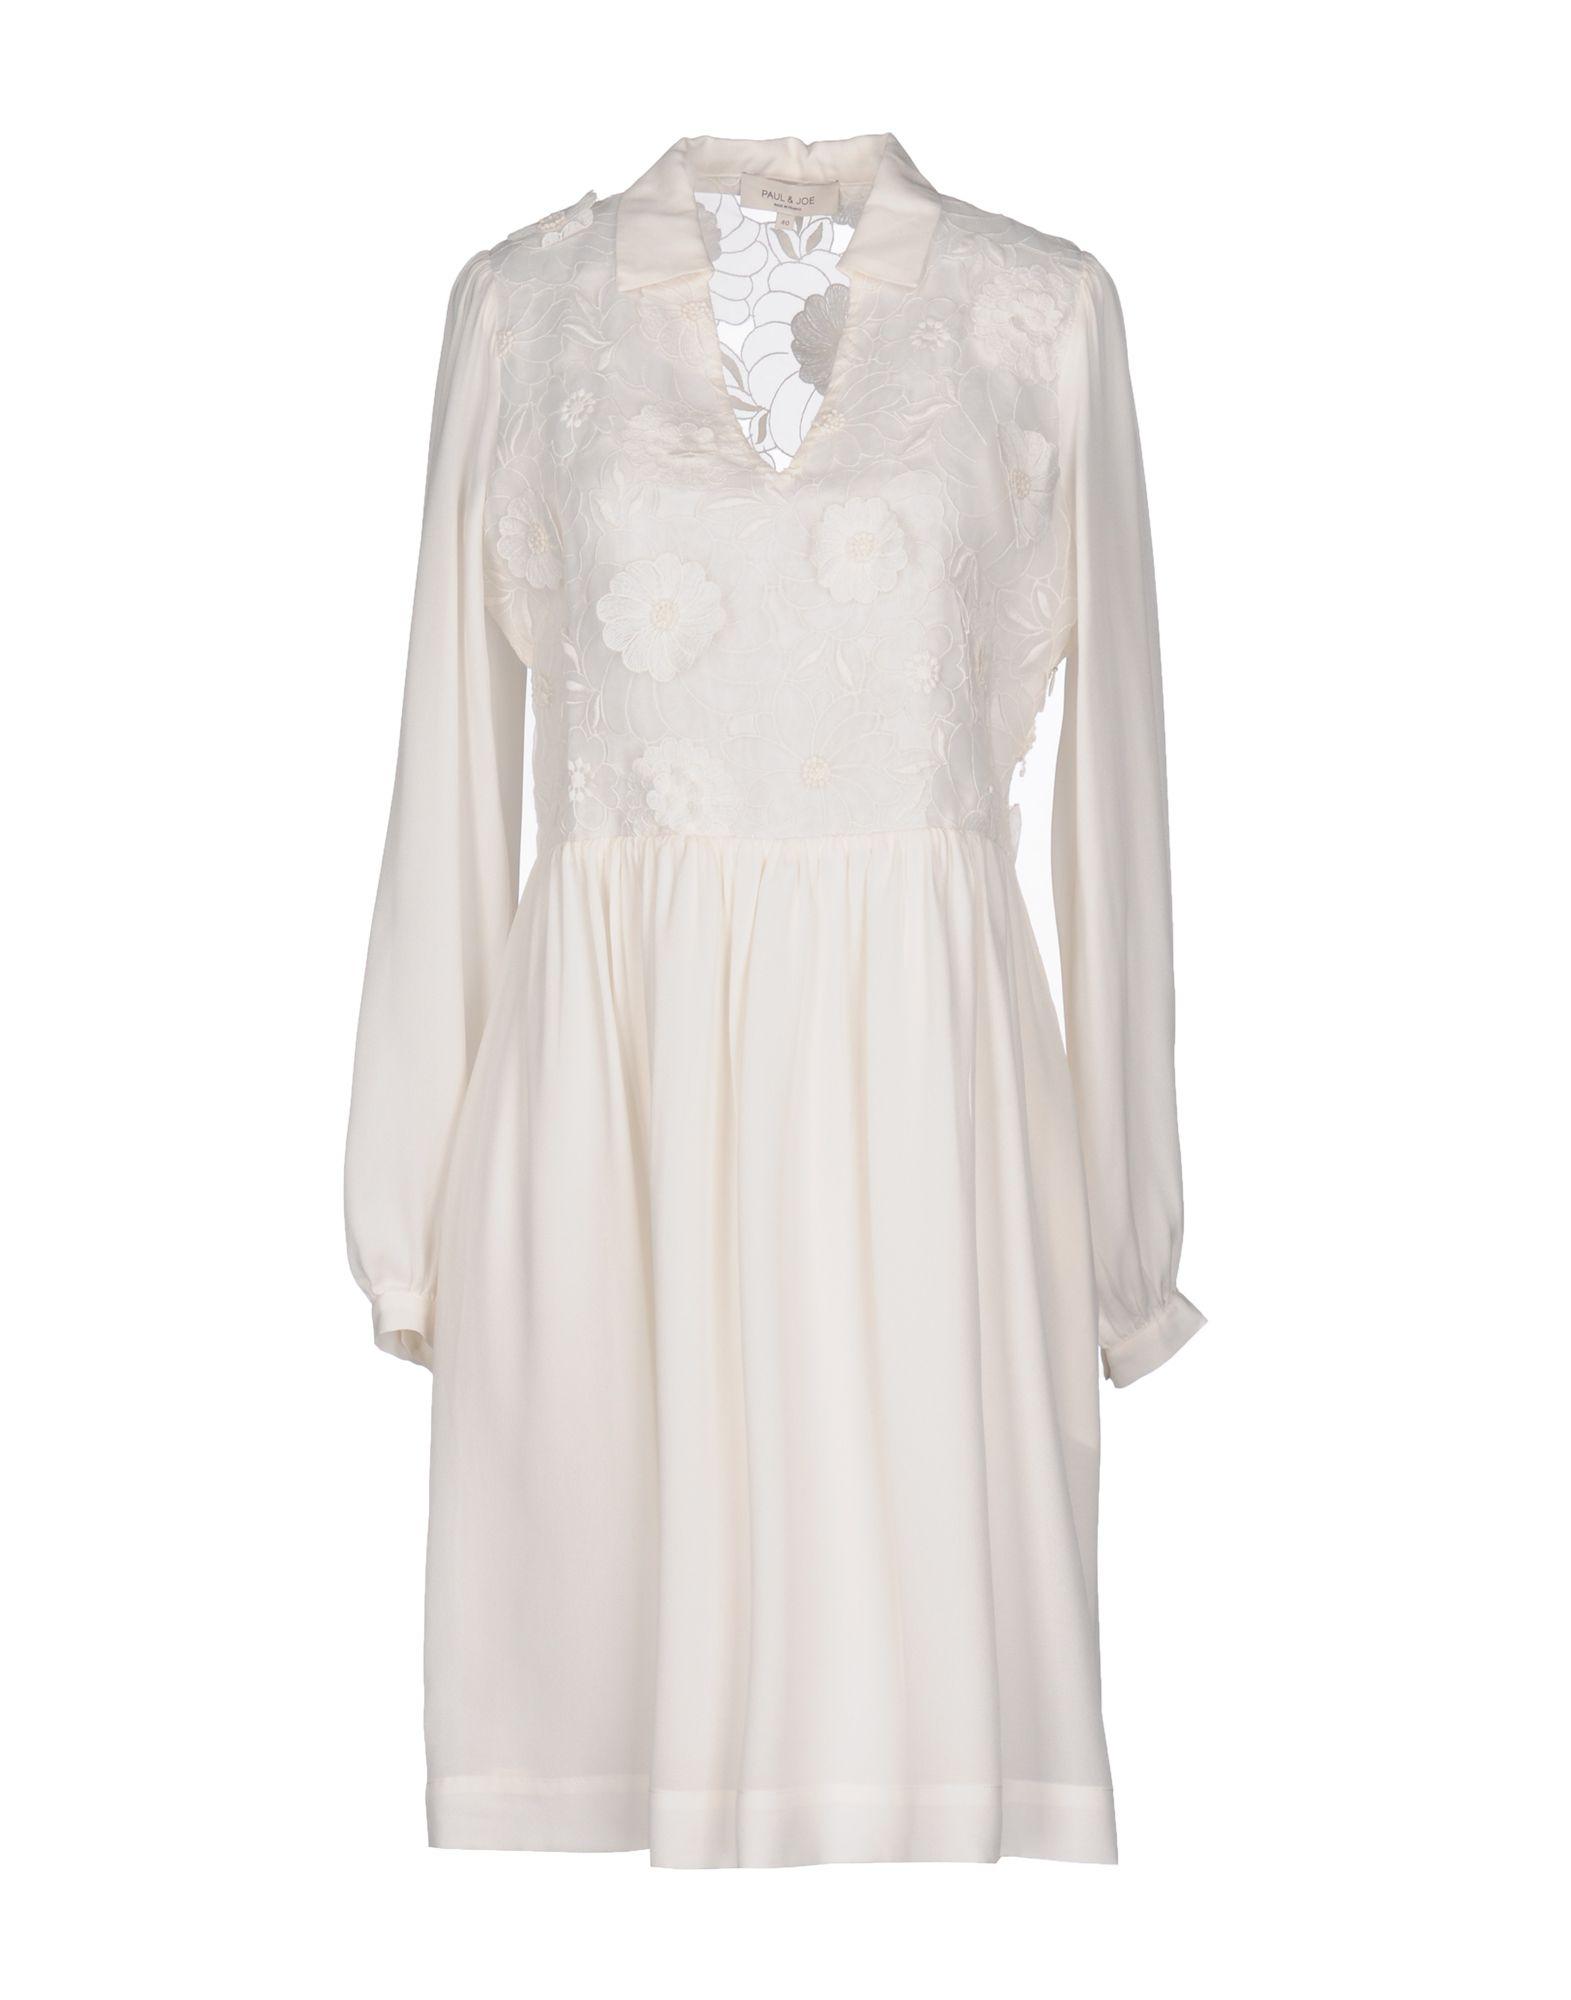 En Ligne Joe À Paulamp; Robe De GenouxAcheter Femme 0OPXk8wn